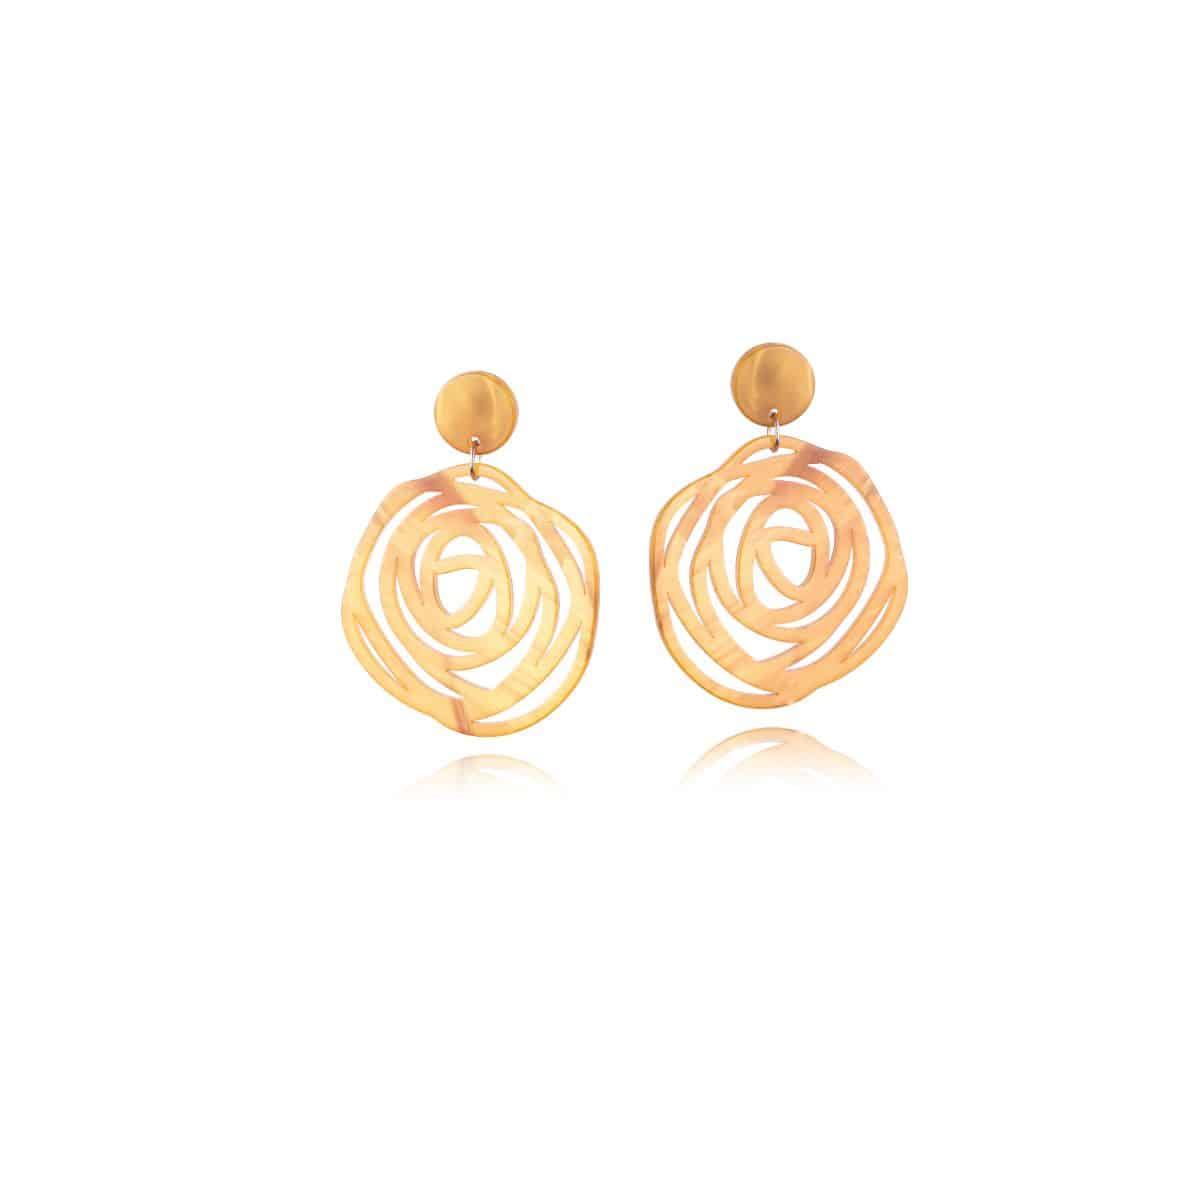 Twister earrings, yellow resin with openwork circular shape.